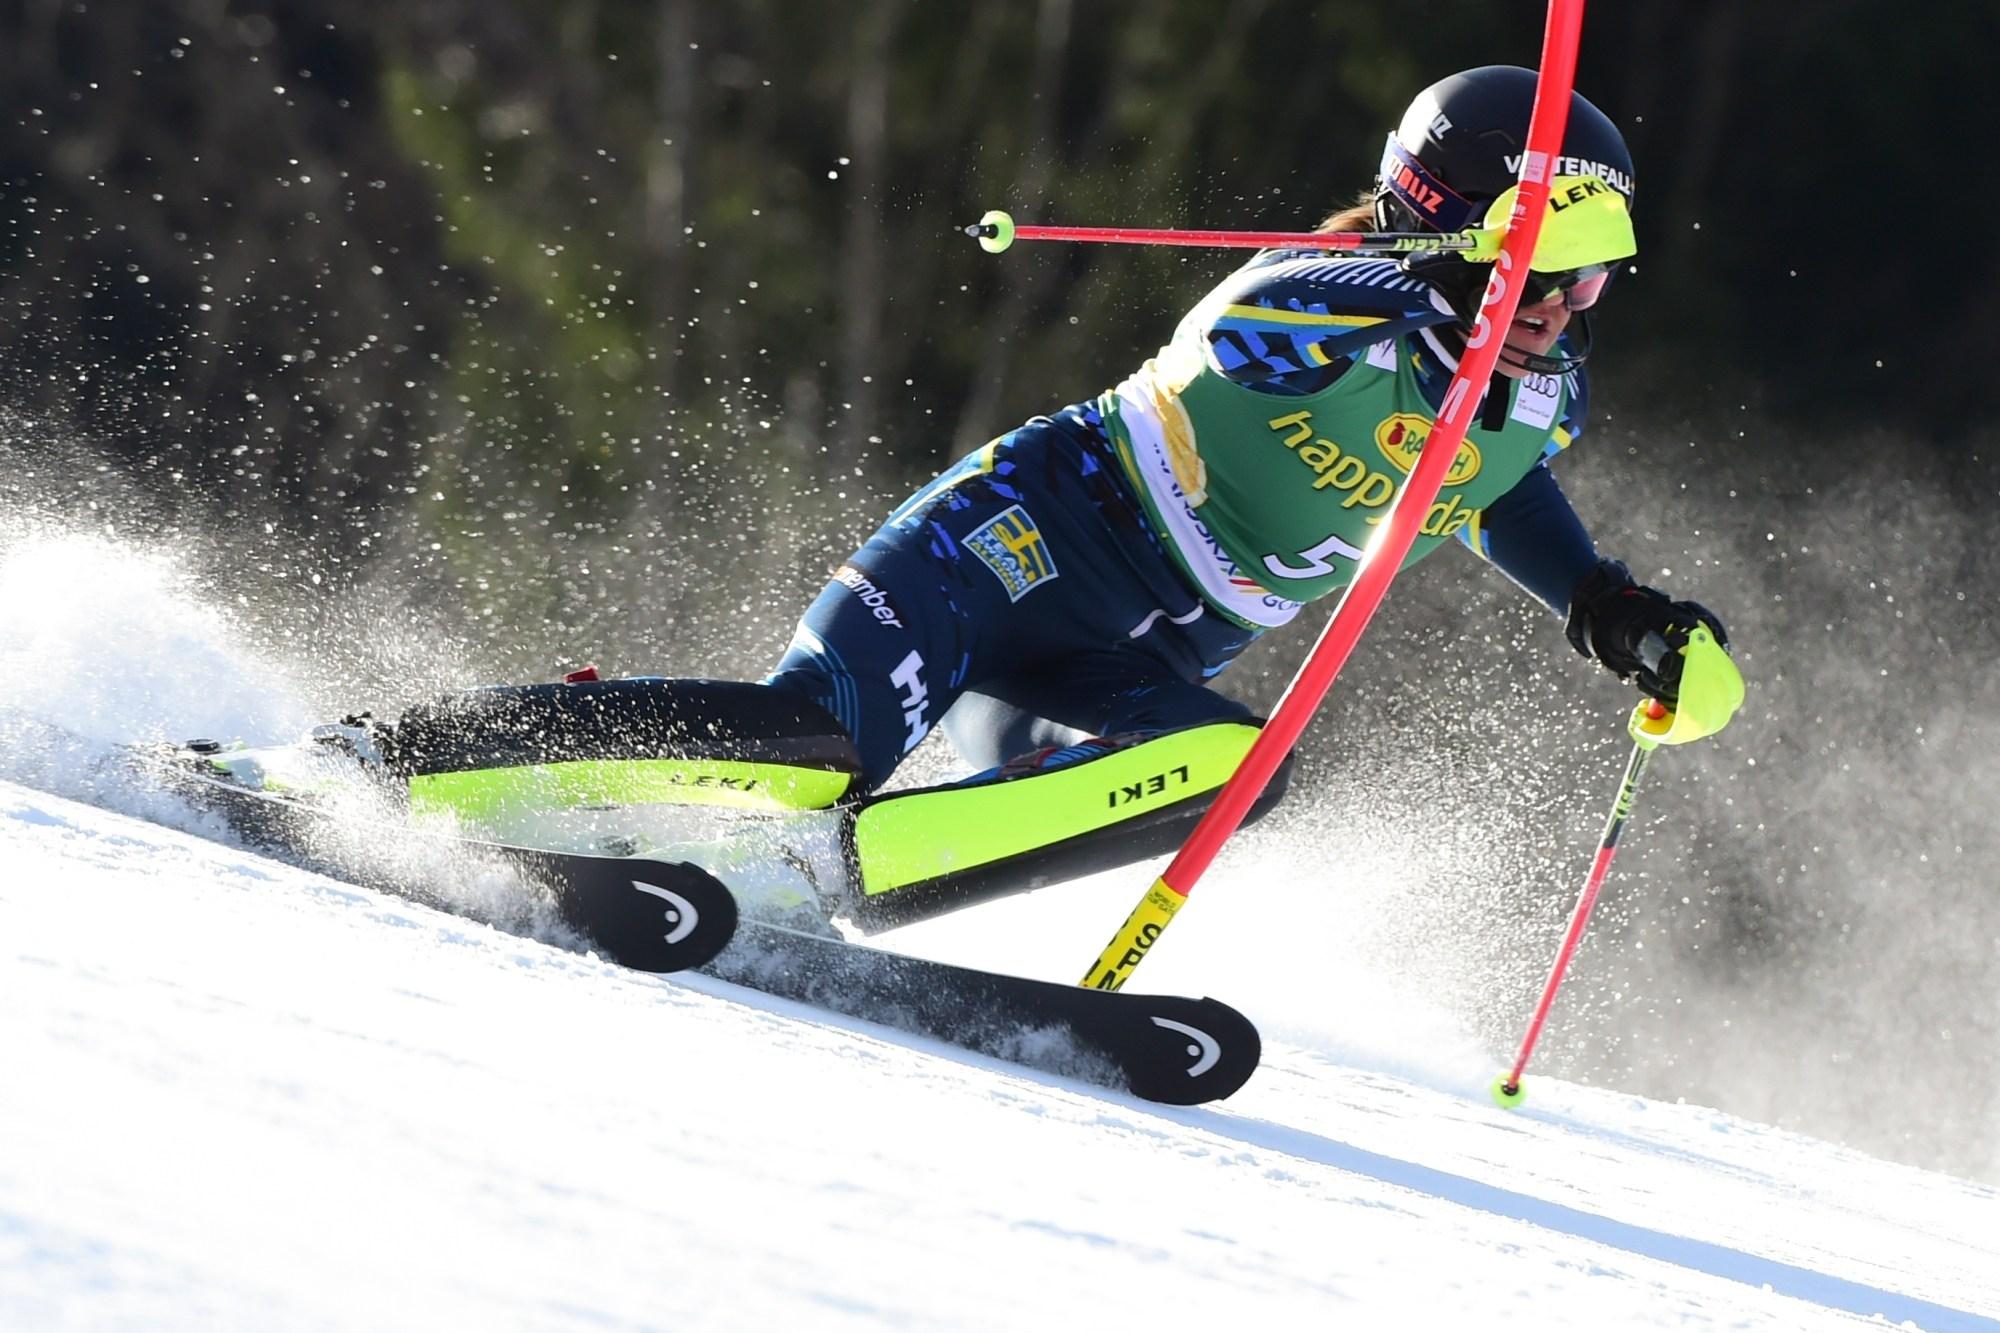 Vlhova Wins Slalom To Overtake Absent Shiffrin In